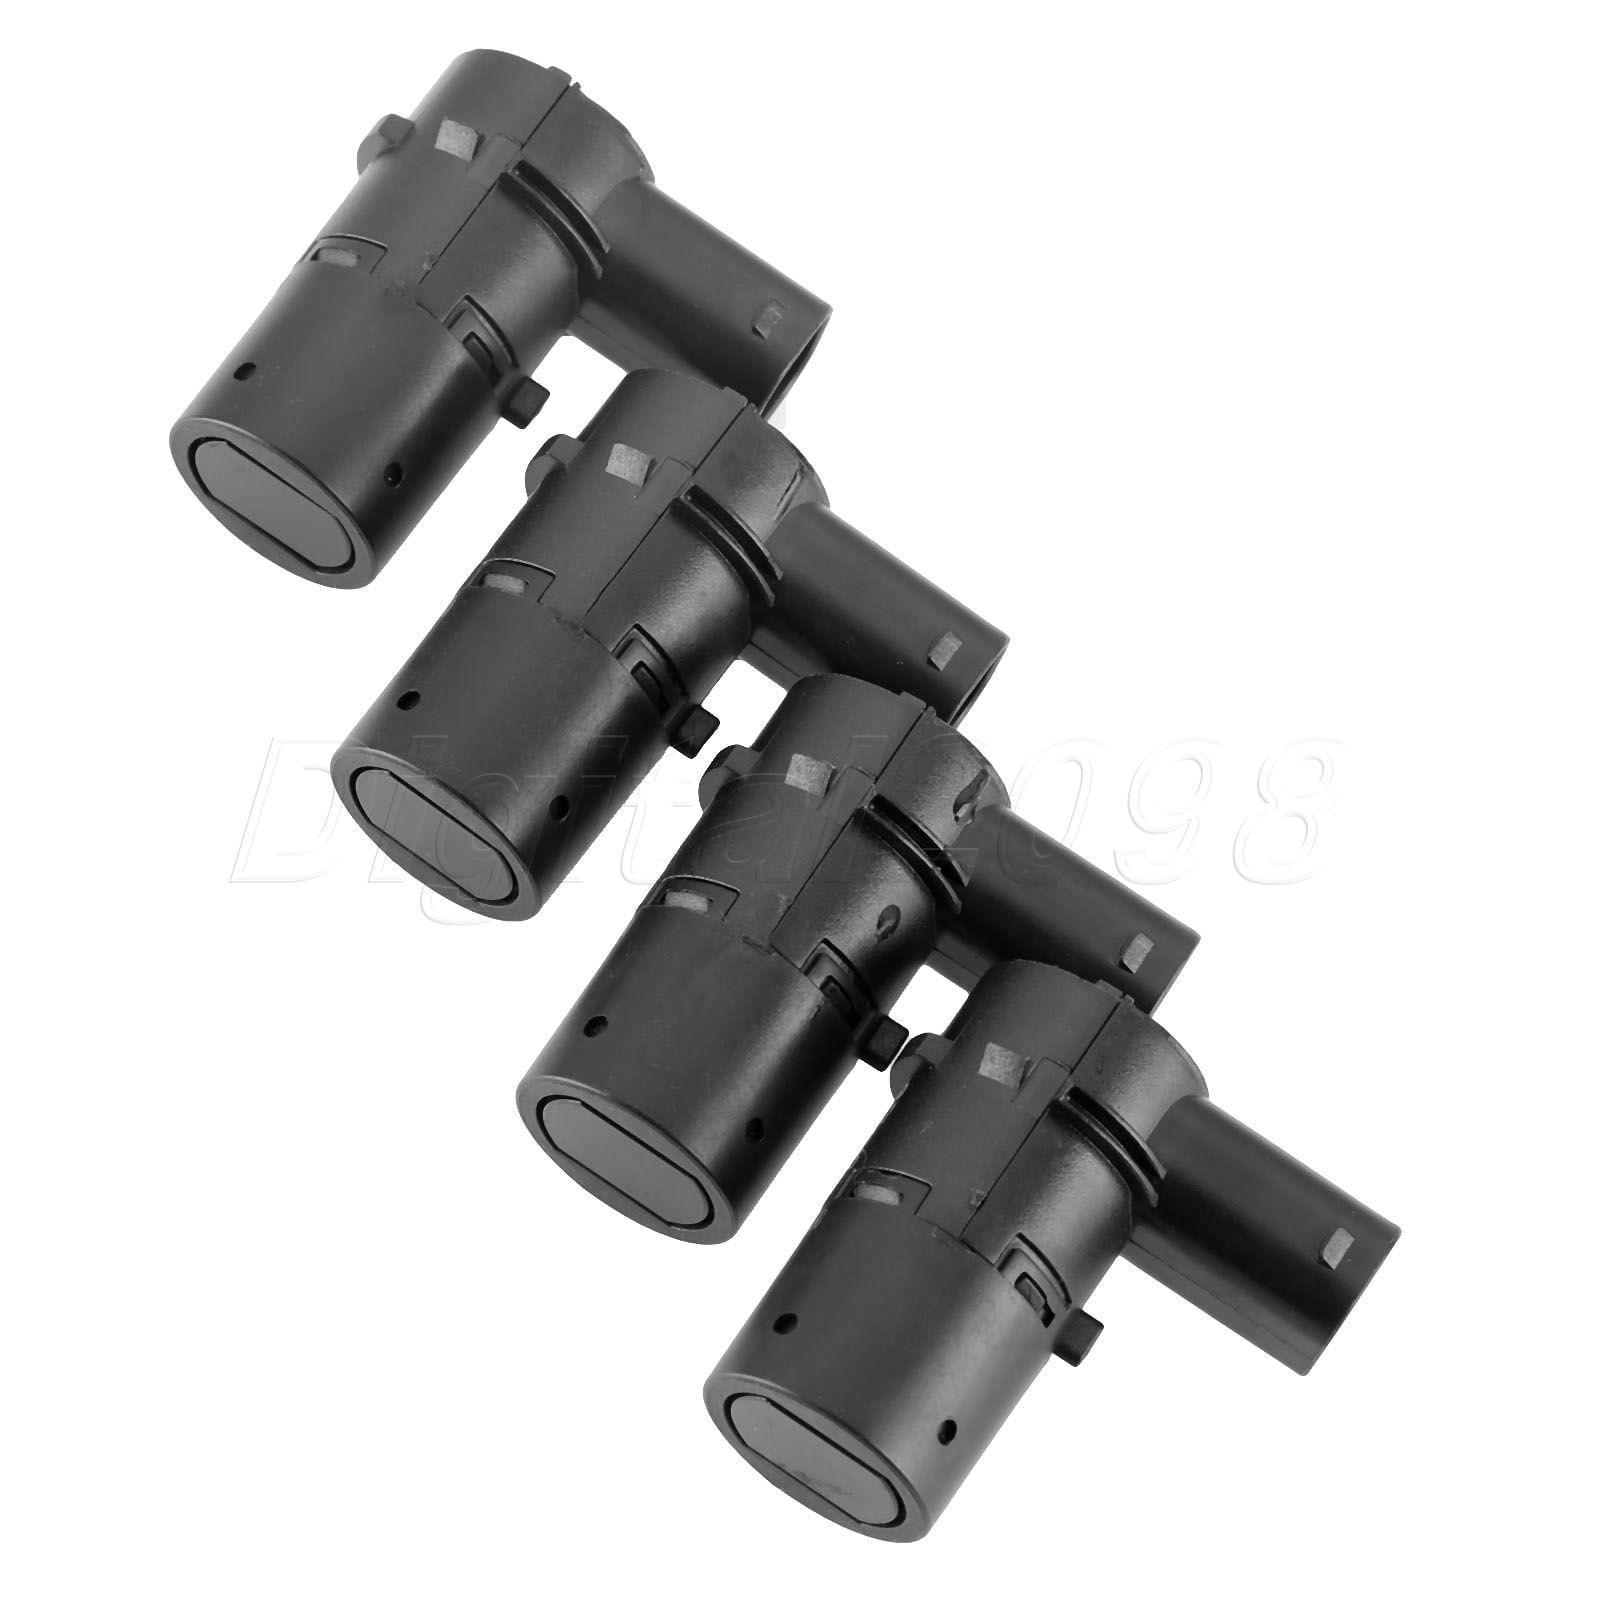 Yetaha 4pcs PDC Parking Sensor Reverse Assist Backup Parksensor 4711842 5266523 For Saab 9-5 Volvo S40 60 80 V50 70 XC70 XC90 new set 4 9288230 pdc parking distance sensor reverse assist for bmw 0263013972